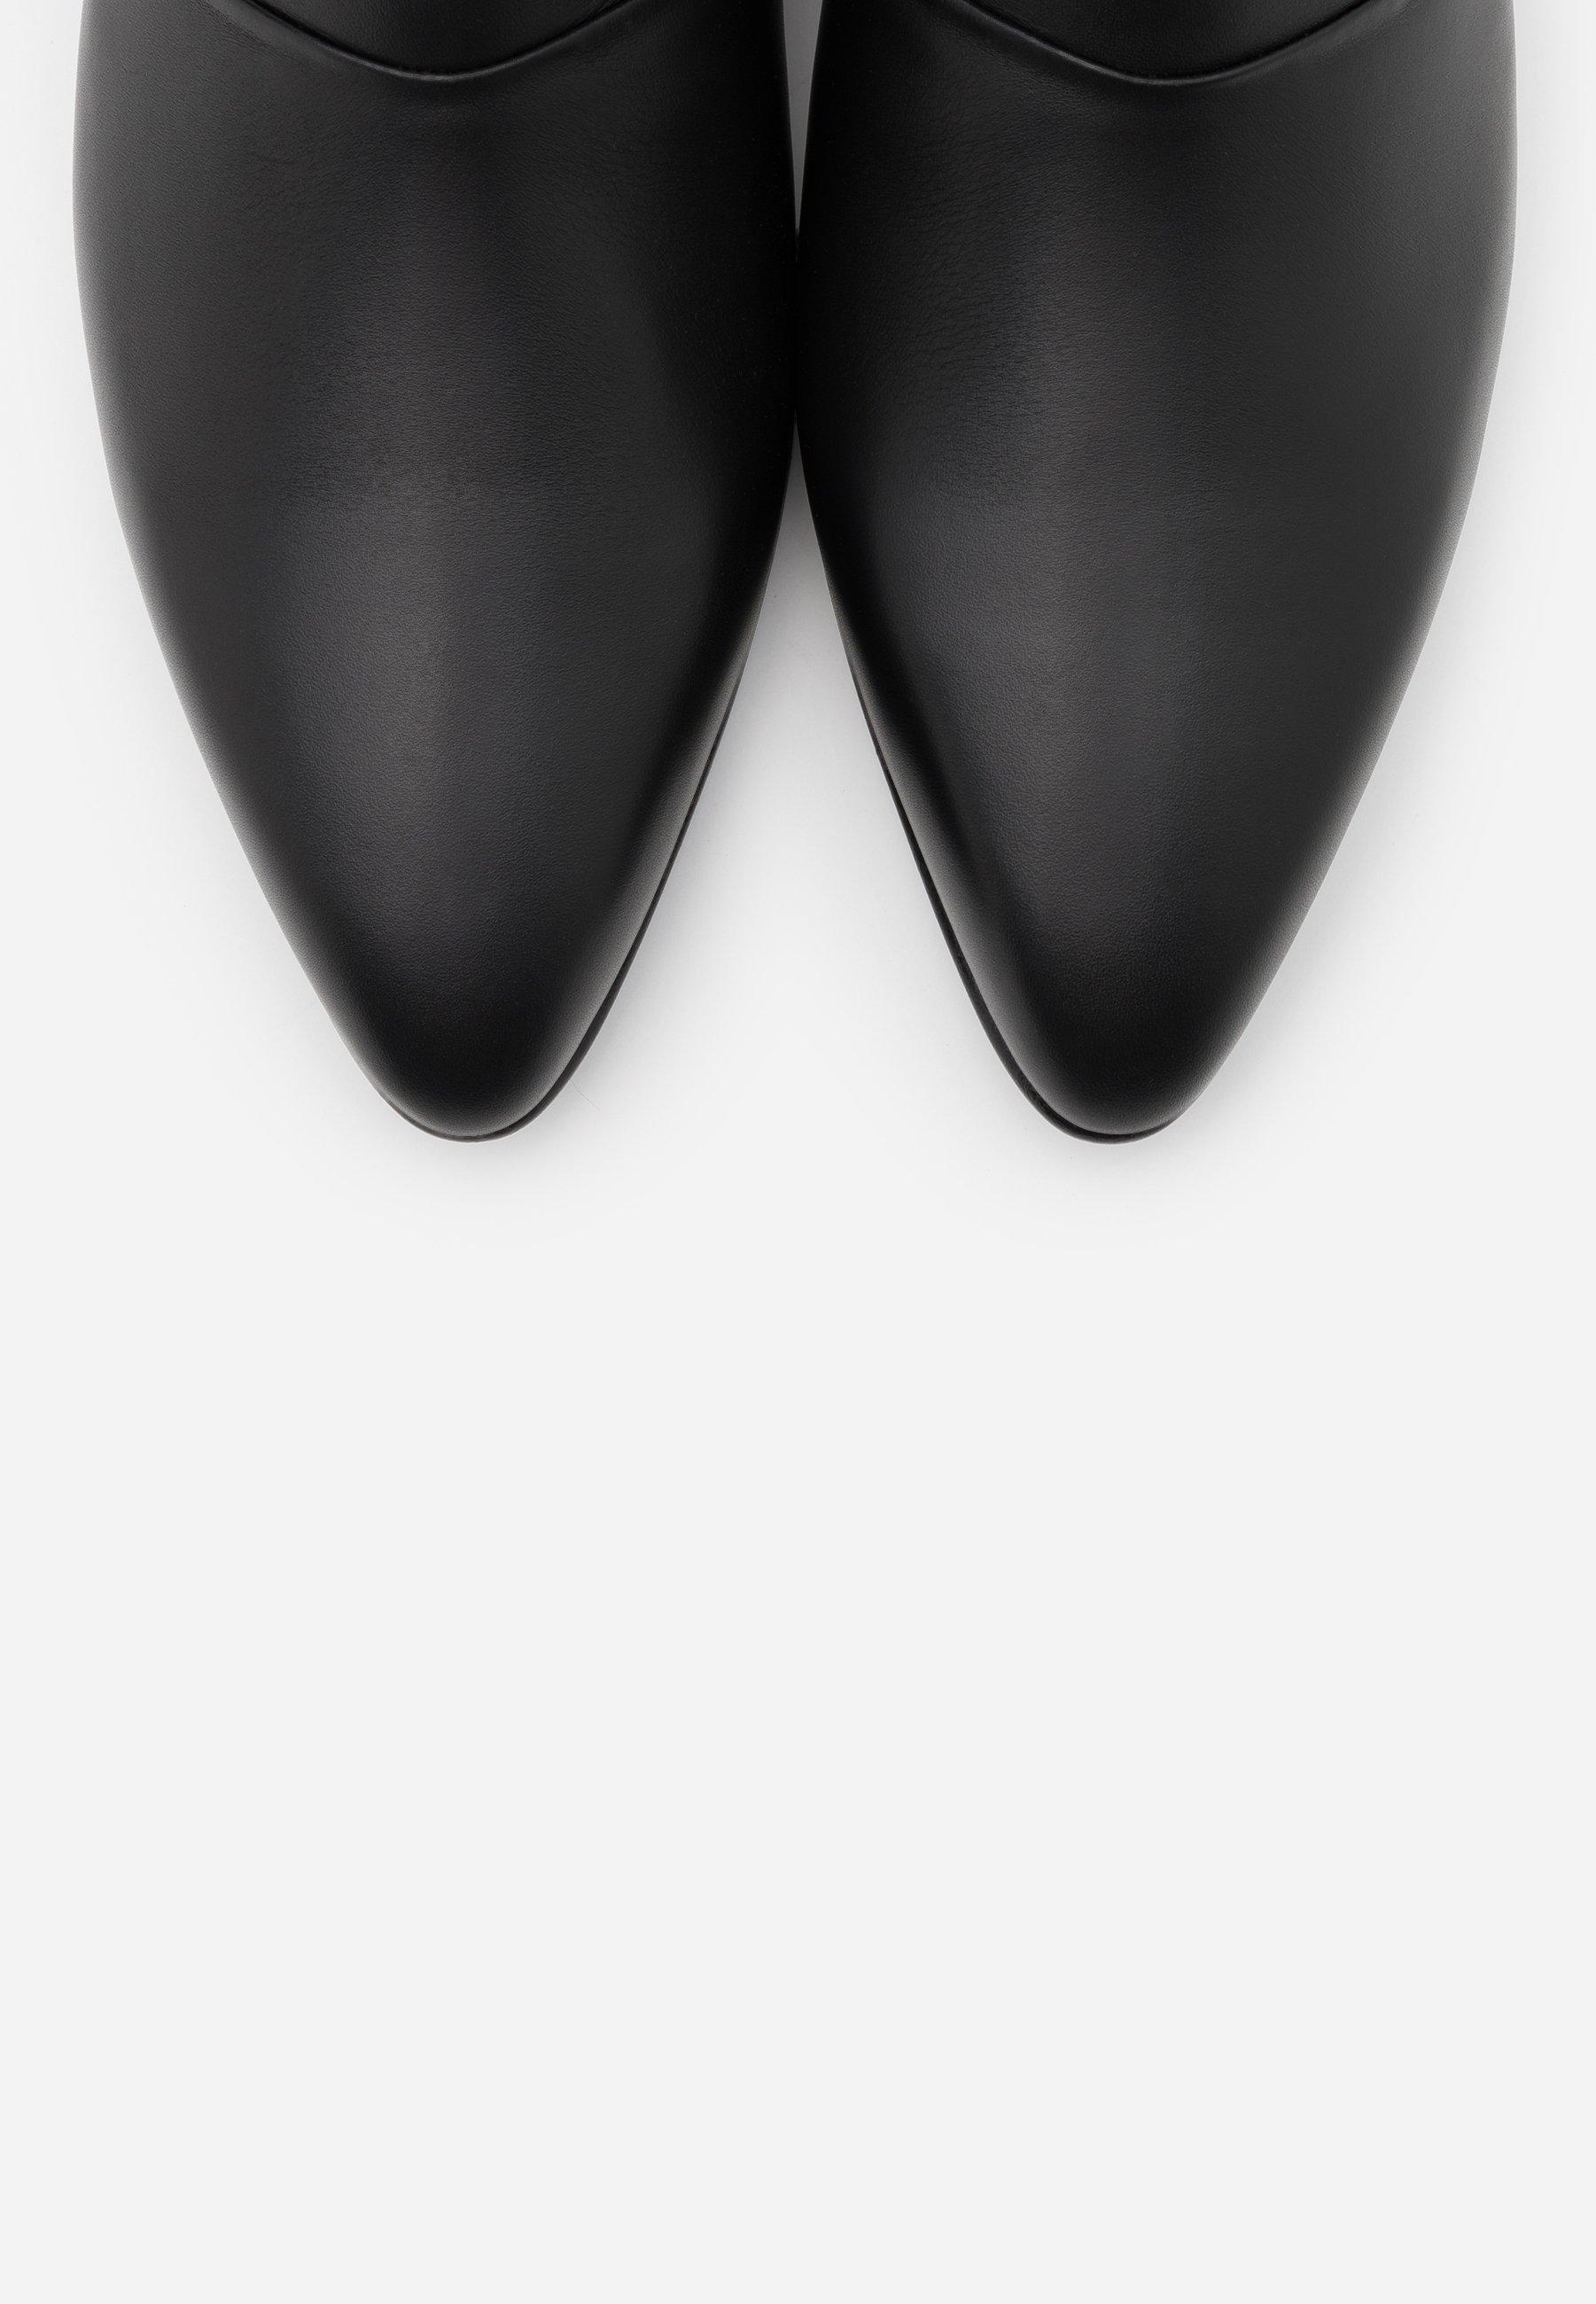 3.1 Phillip Lim Dree Bootie - Støvletter Black